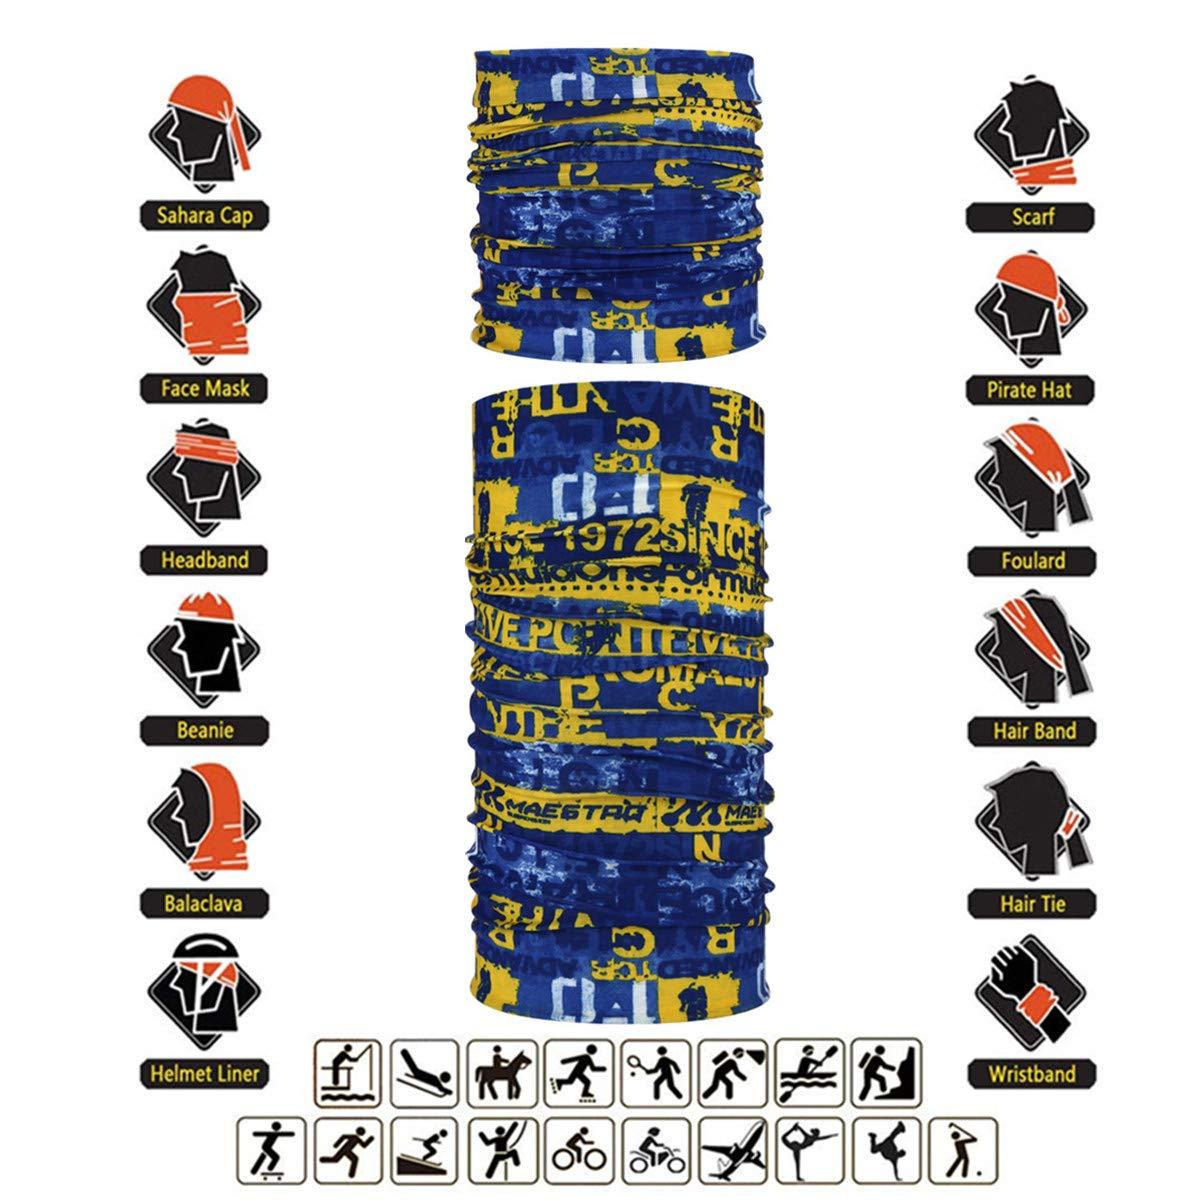 Topren High Elastic Magic Headband Bandanas Fishing and Other Outdoor Activities Outdoor Seamless Multi-Purpose Magic Scarf Elastic Headband Gaiter Balaclava for Riding Motorcycling Hiking